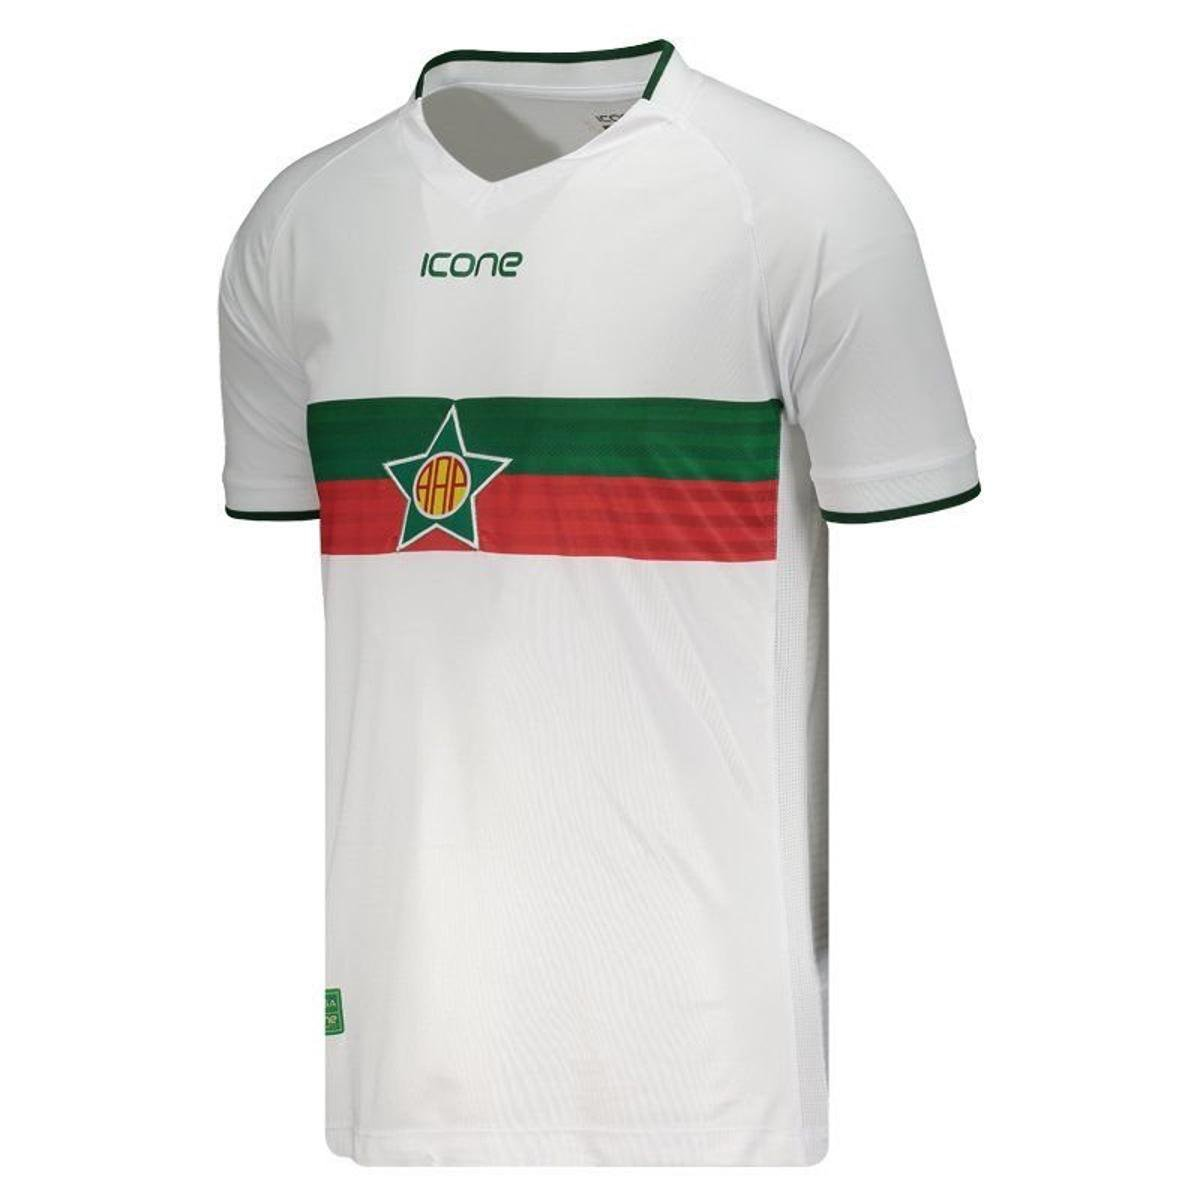 3fae89c81b Camisa Ícone Sports Portuguesa RJ I 2018 Masculina - Branco - Compre ...